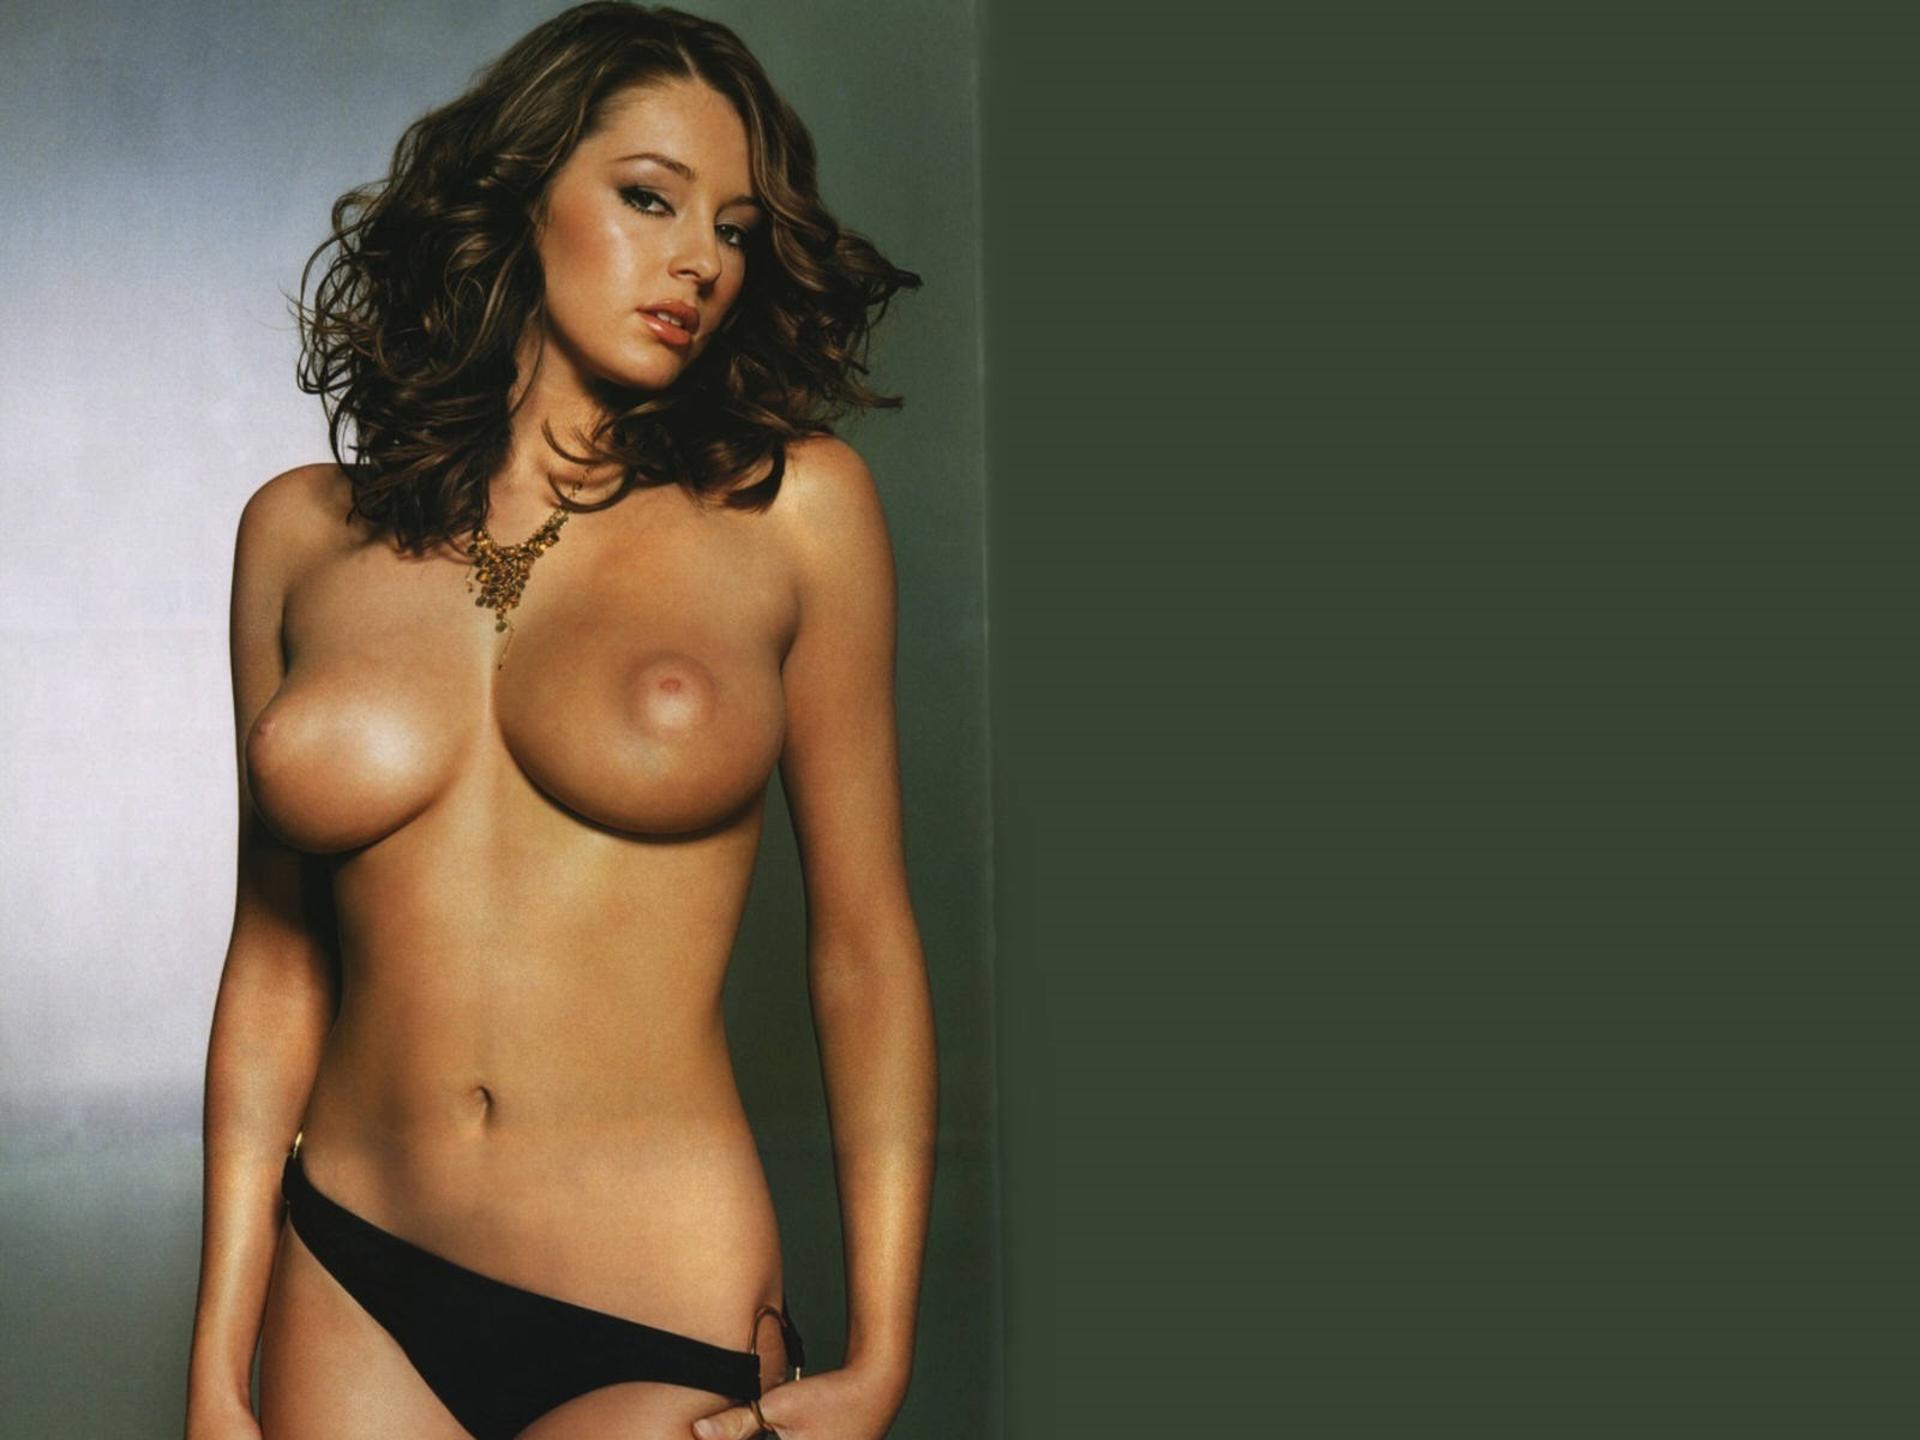 Freebritish glamour model keeley hazell leaked sex tape picscandal